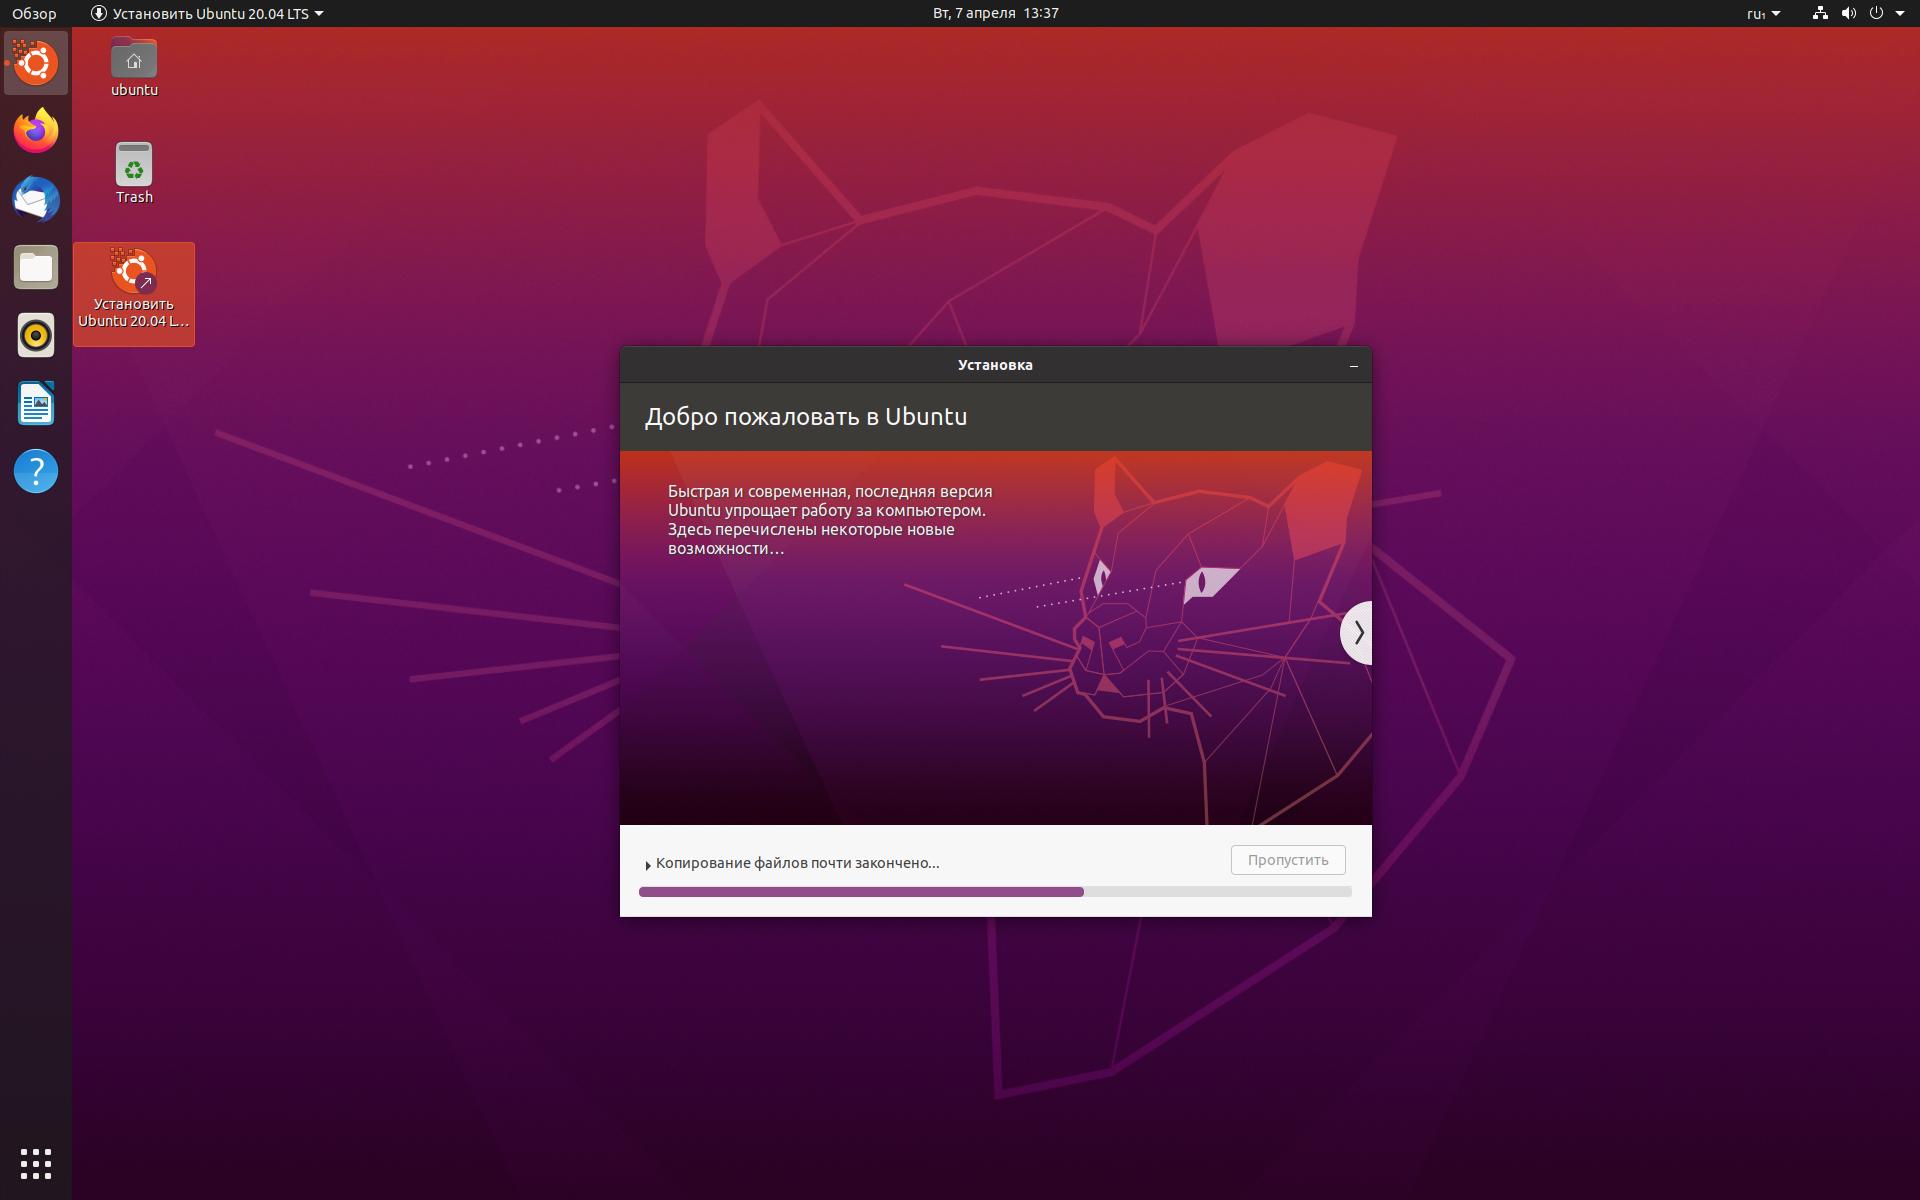 установка ubuntu 20.04